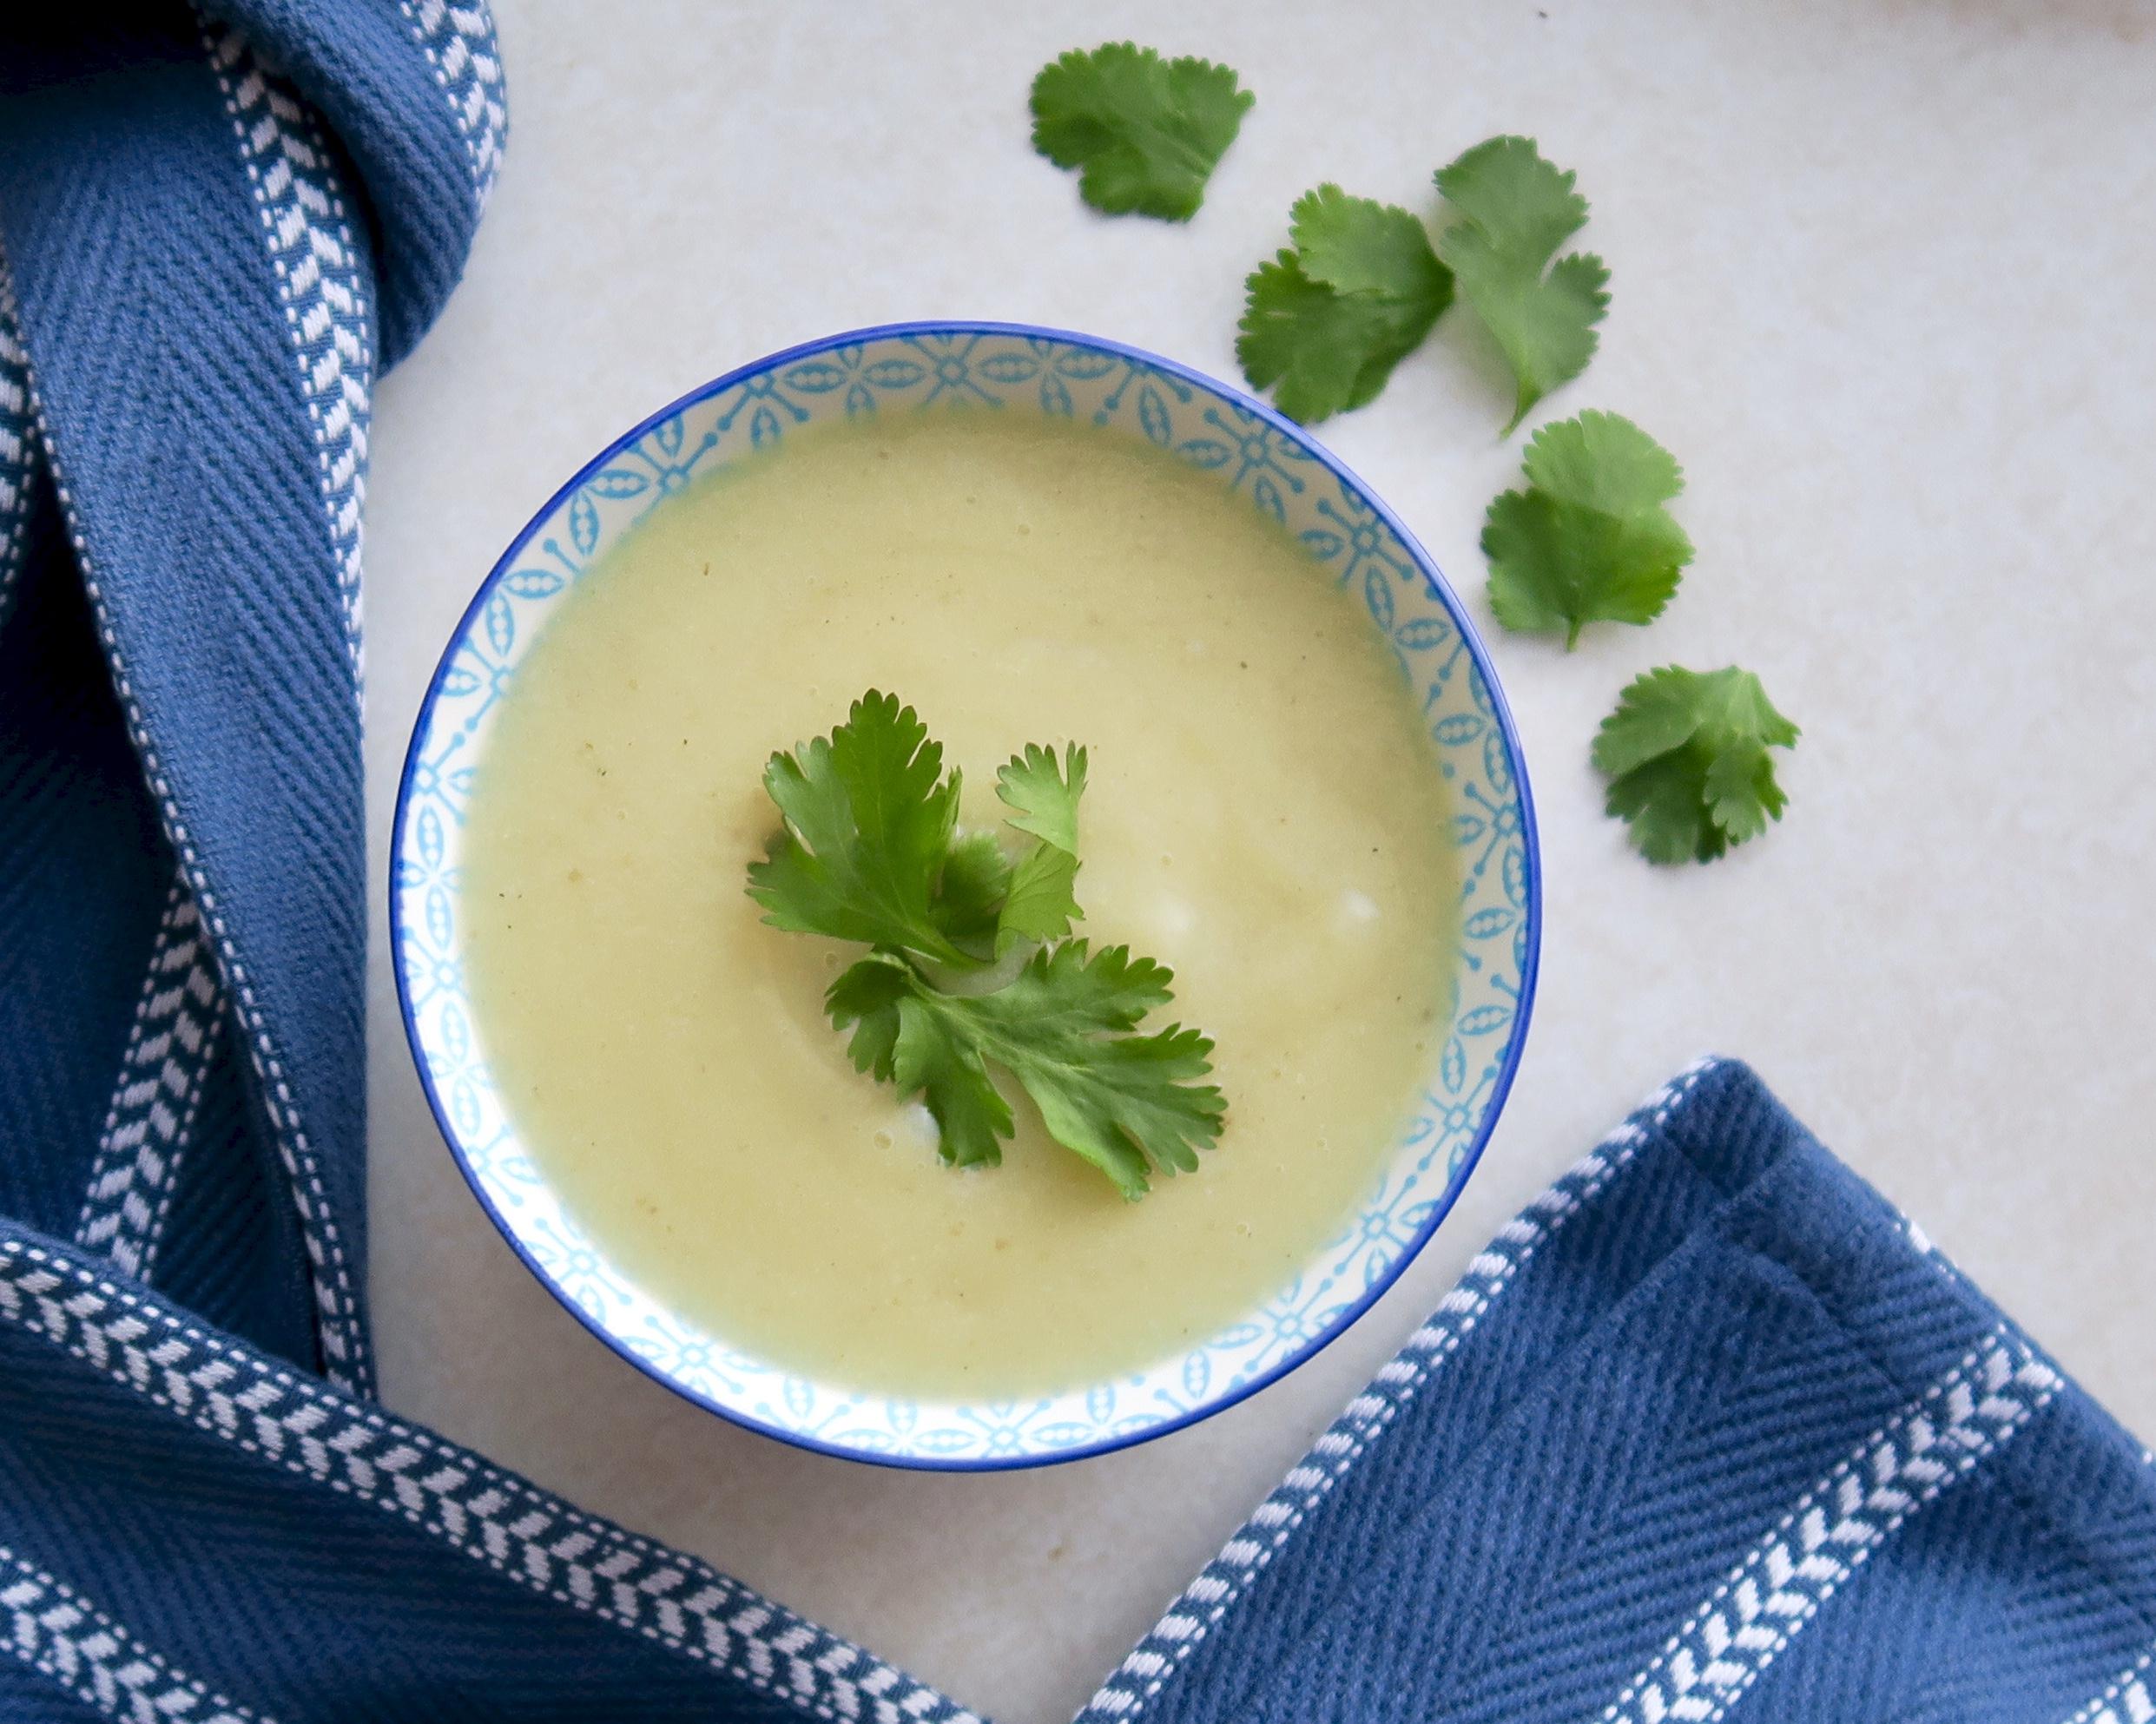 Cauliflower Soup, Lake Superior Kitchen, Whole30, Paleo, Grain Free